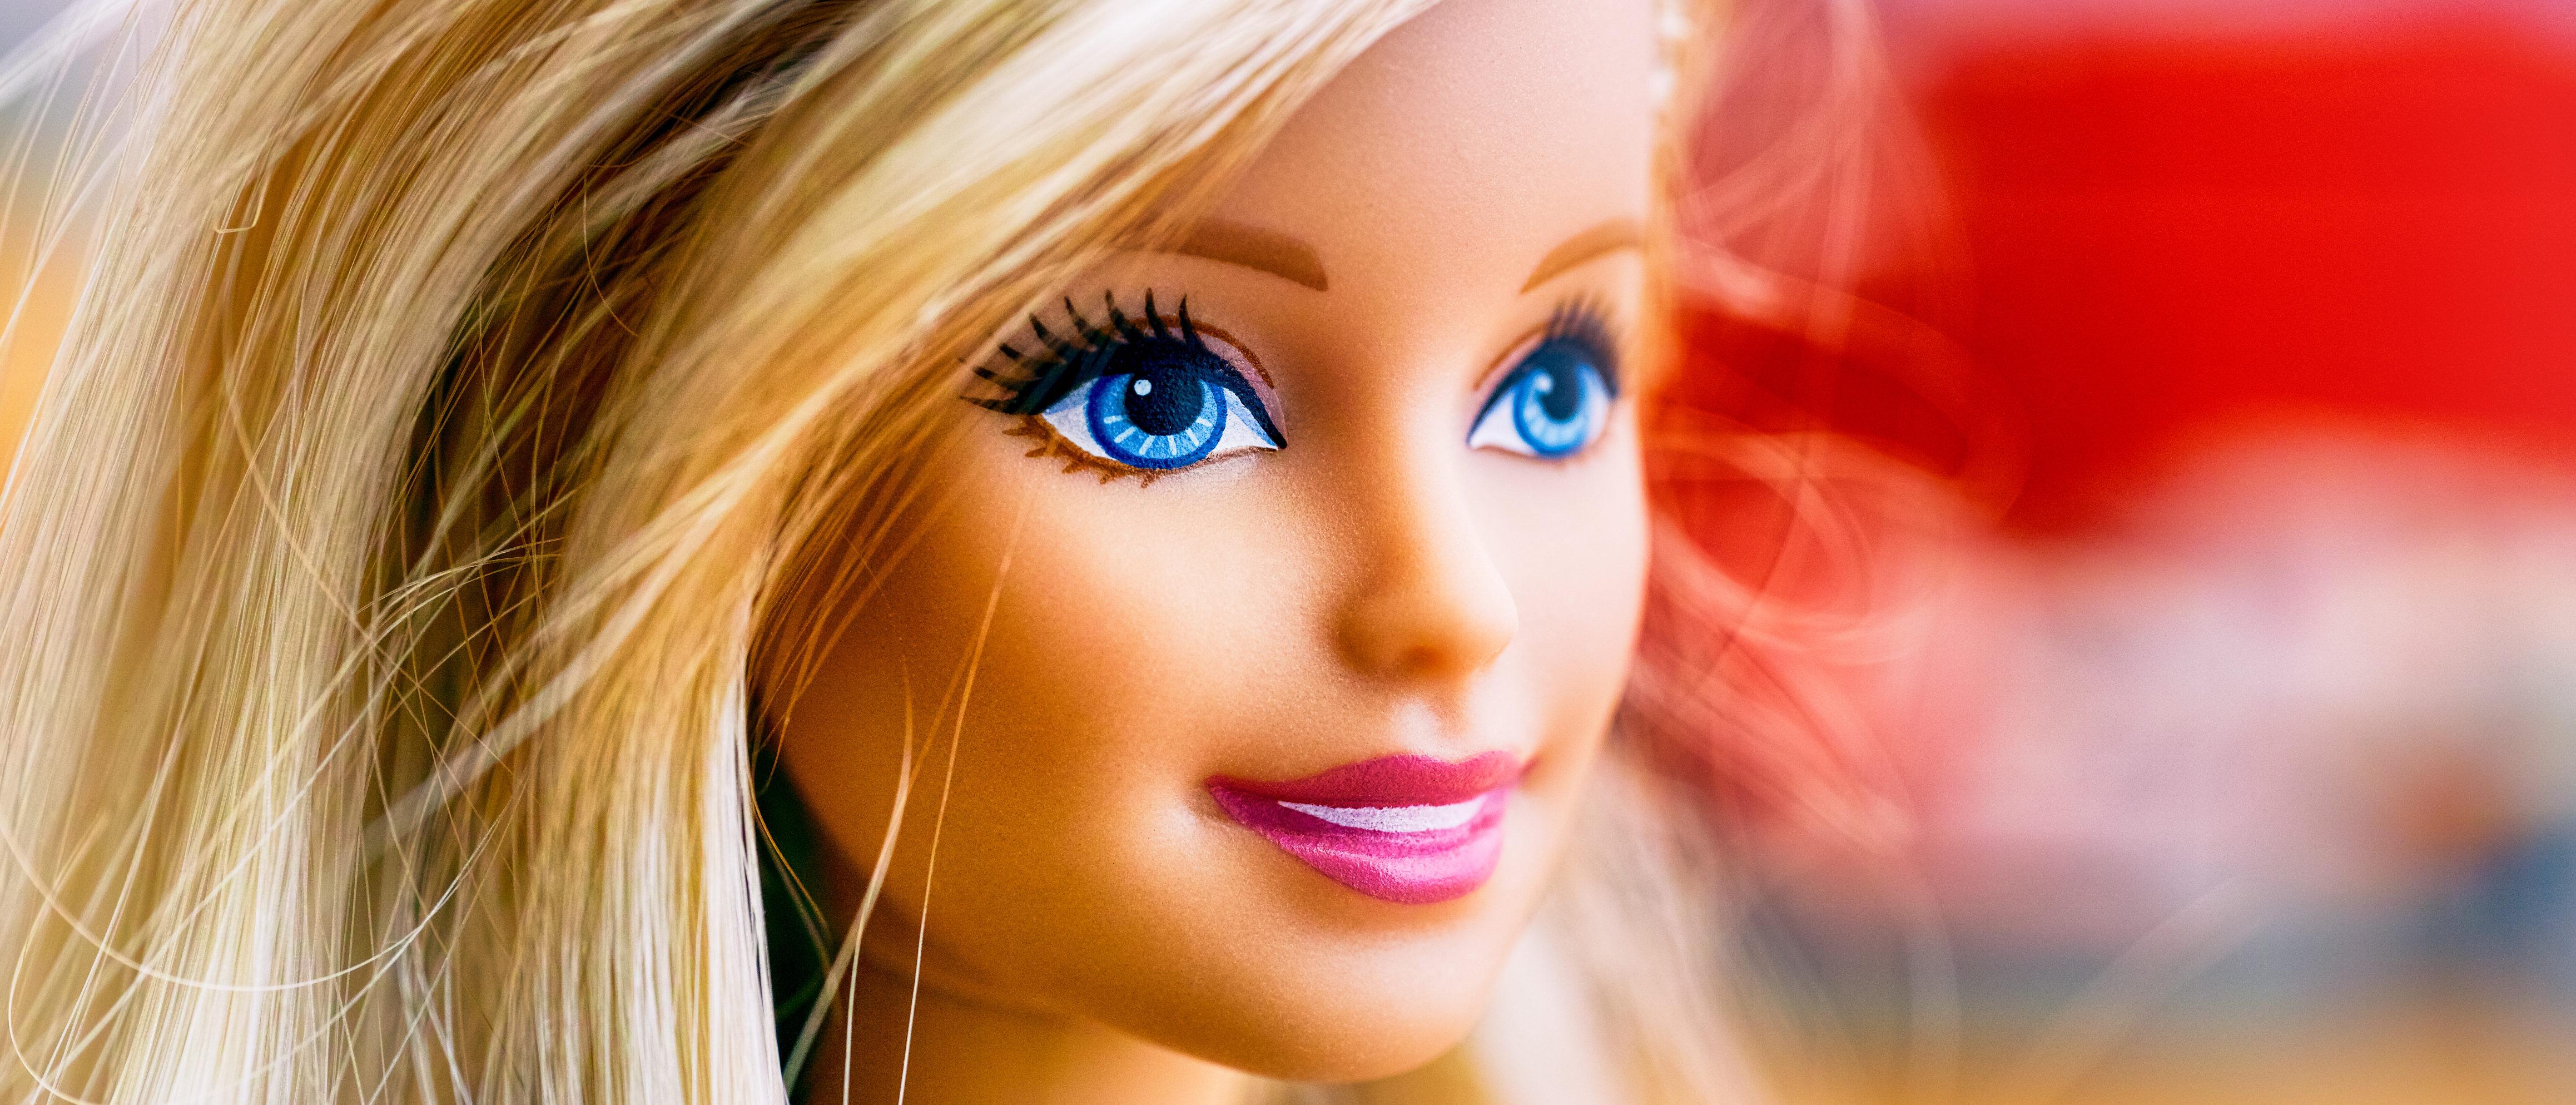 Portrait of Barbie doll with blond hair. (Shutterstock/Ekaterina Minaeva)